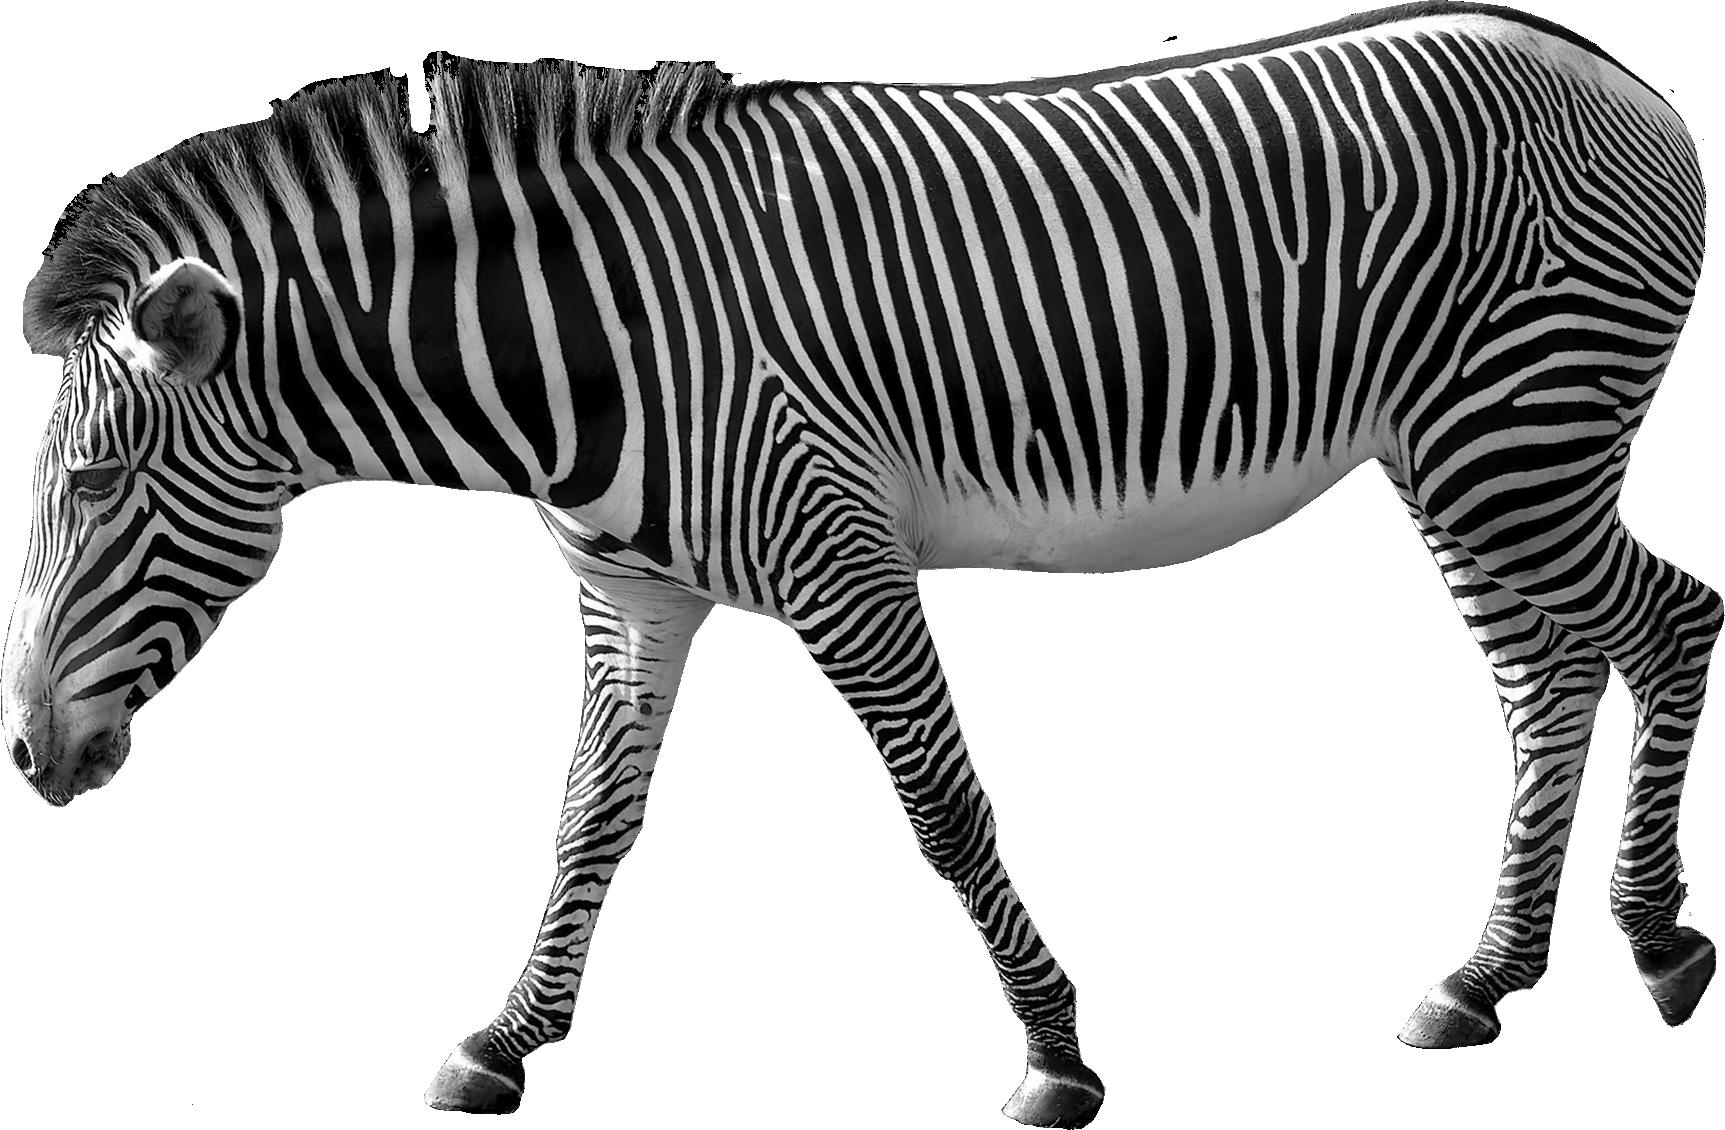 wild_side_element_3__1_.png (1725×1130) Zebra, Png